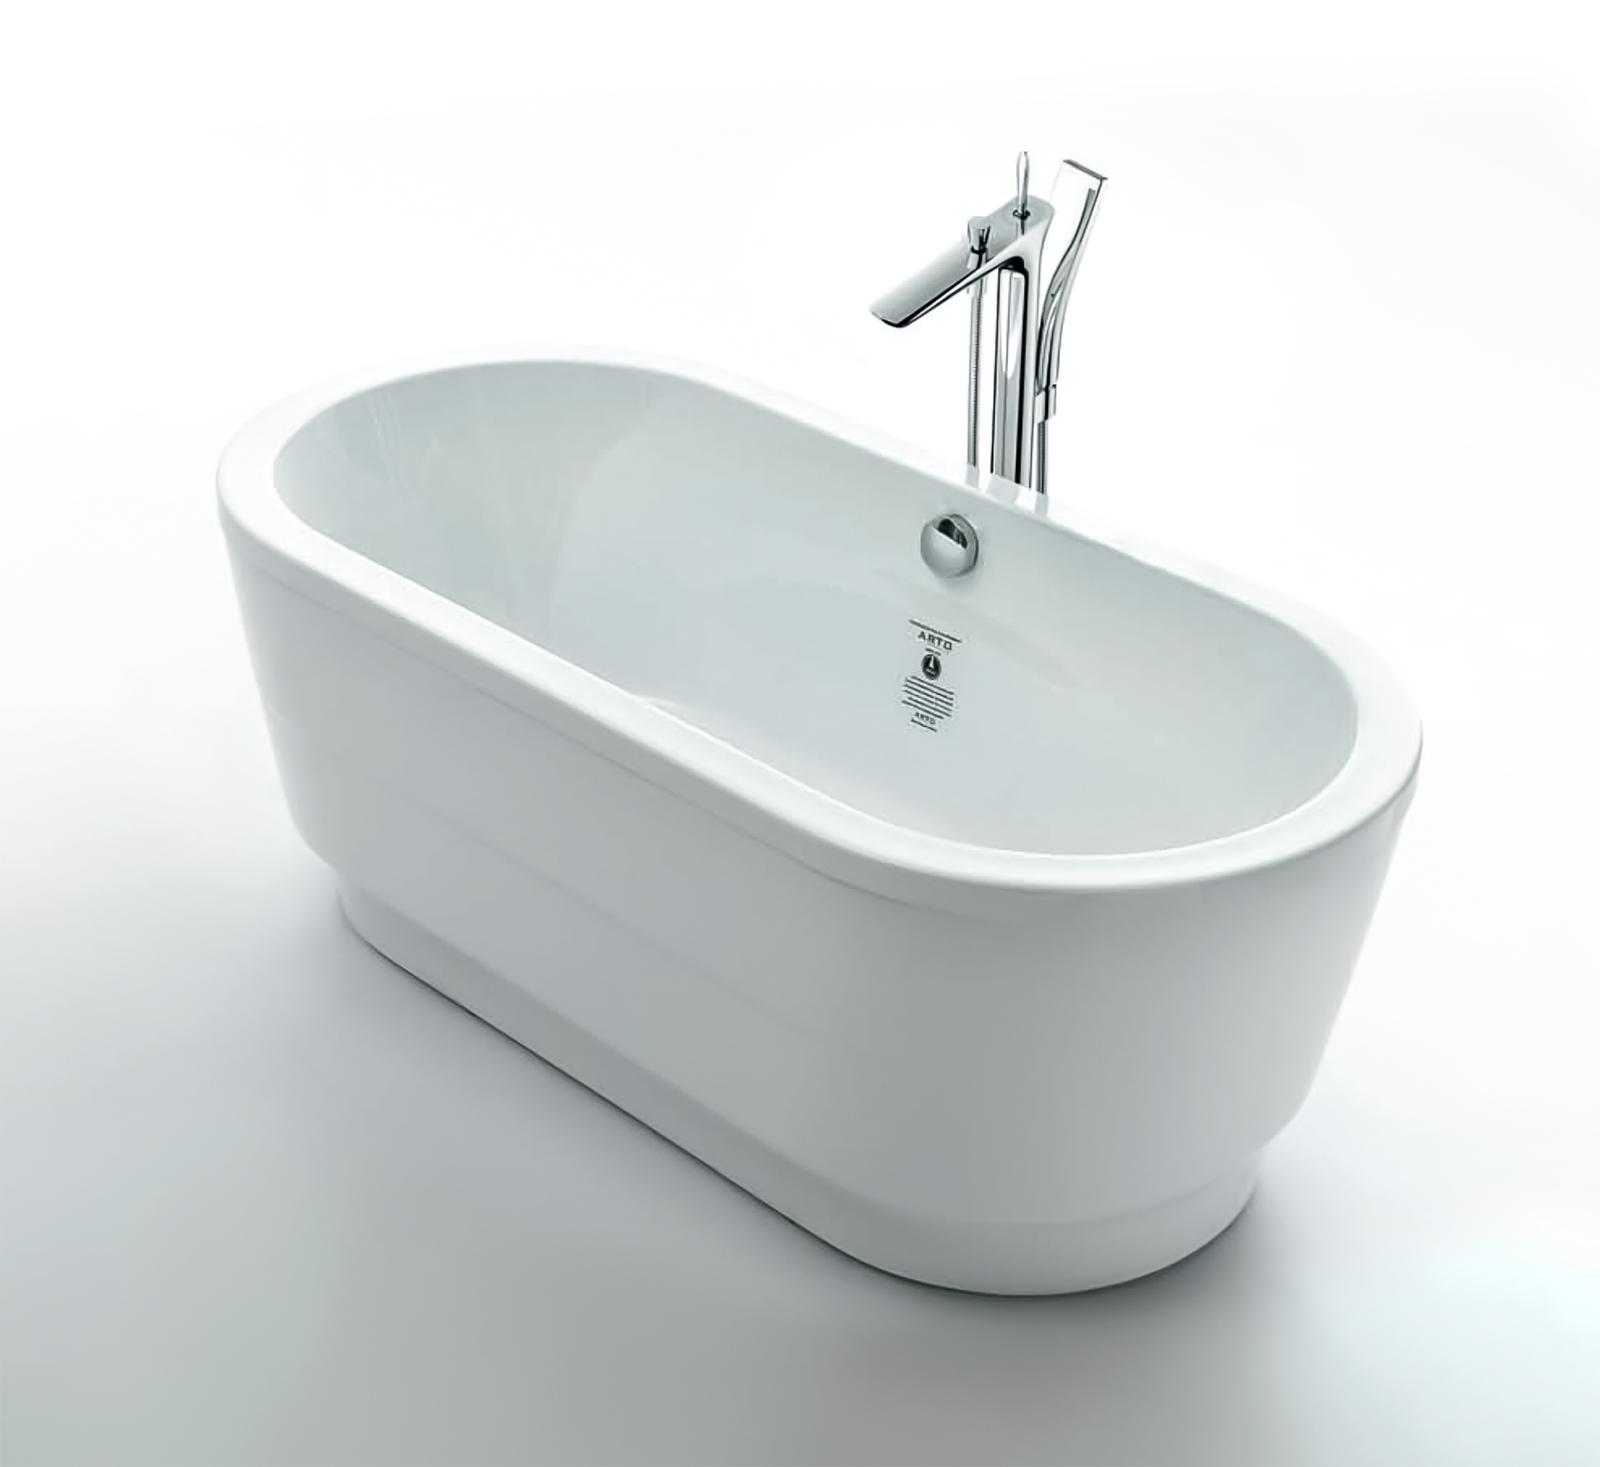 Walrus LC160B 獨立式橢圓型纖維浴缸 1600x750x580mm 白色